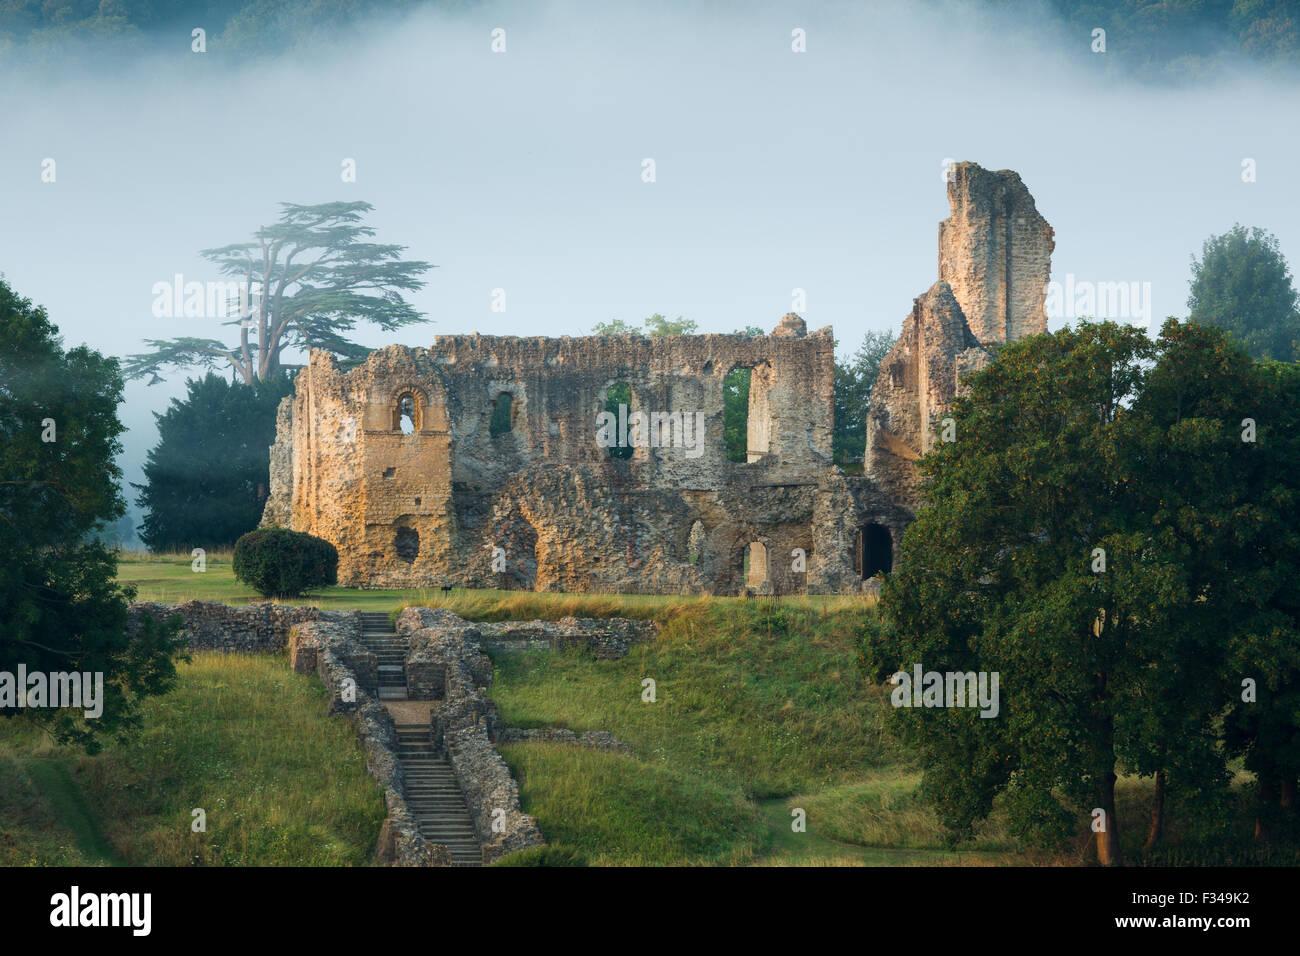 Alten Sherborne Castle, Sherborne, Dorset, England, Vereinigtes Königreich Stockbild